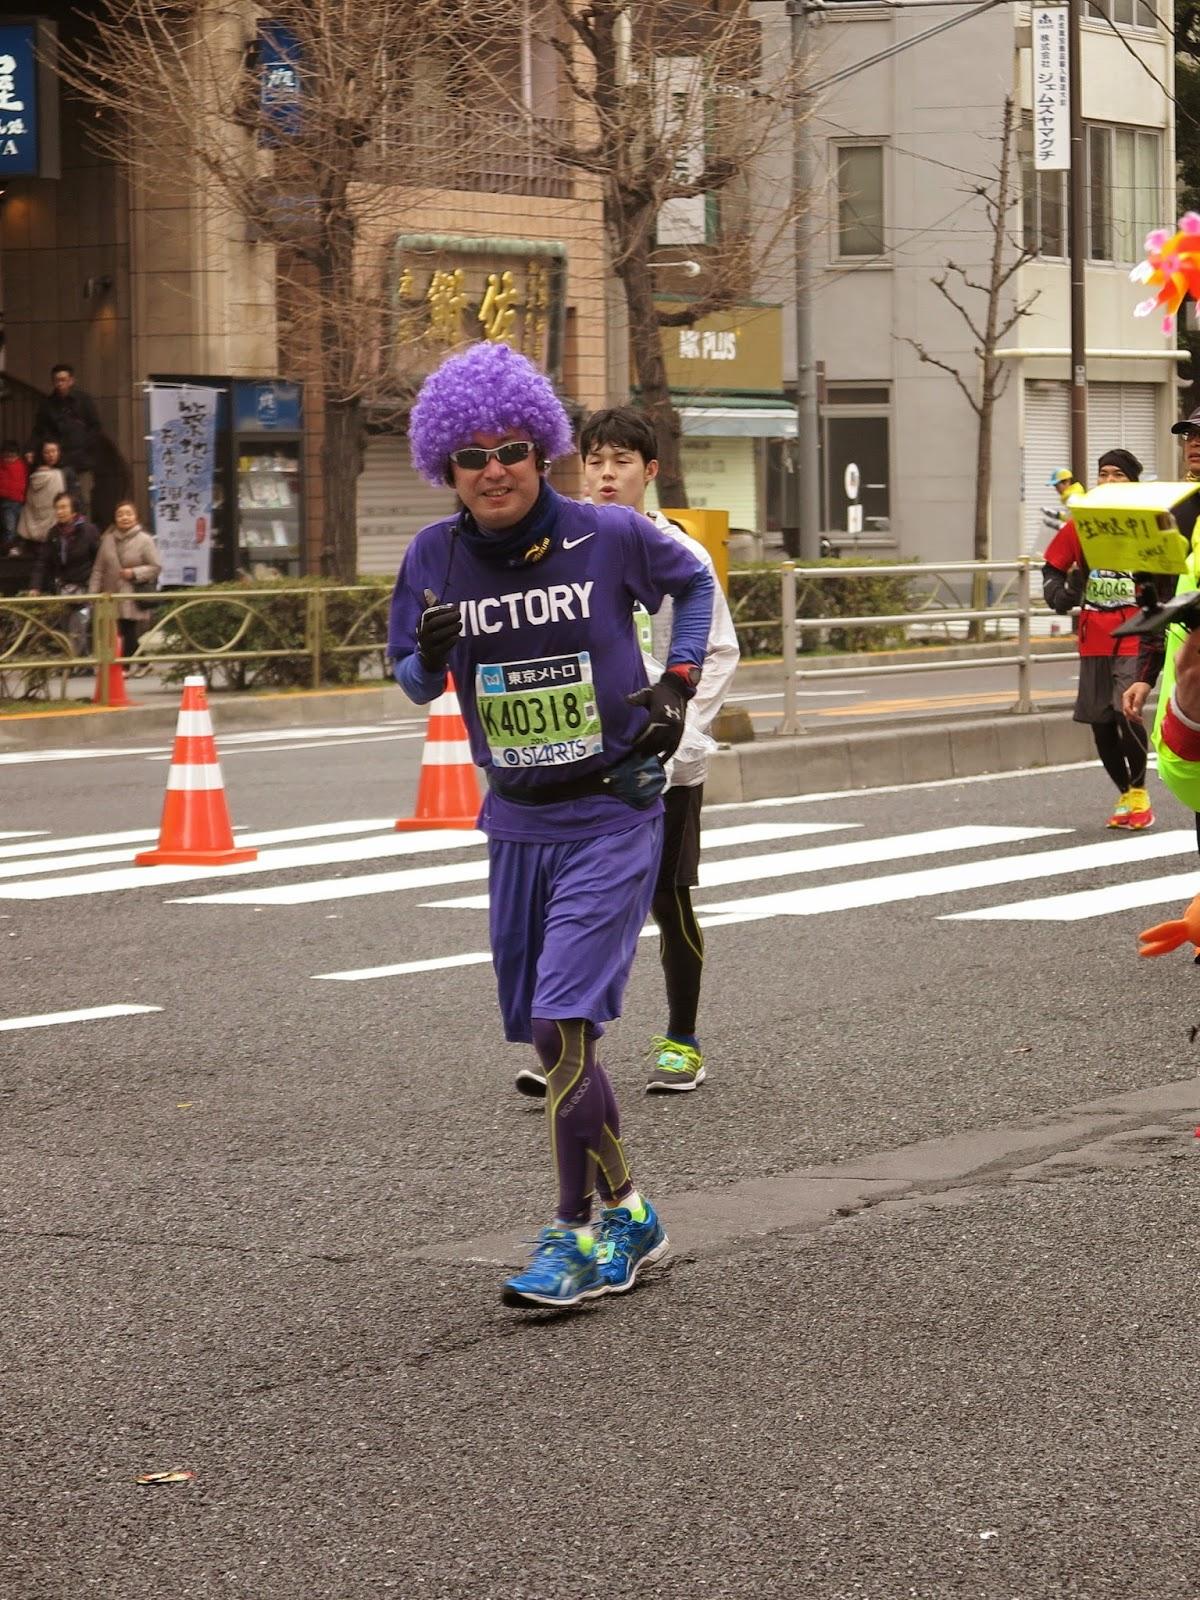 Victory in the Tokyo Marathon 2015, Taito ward, Tokyo, Japan.